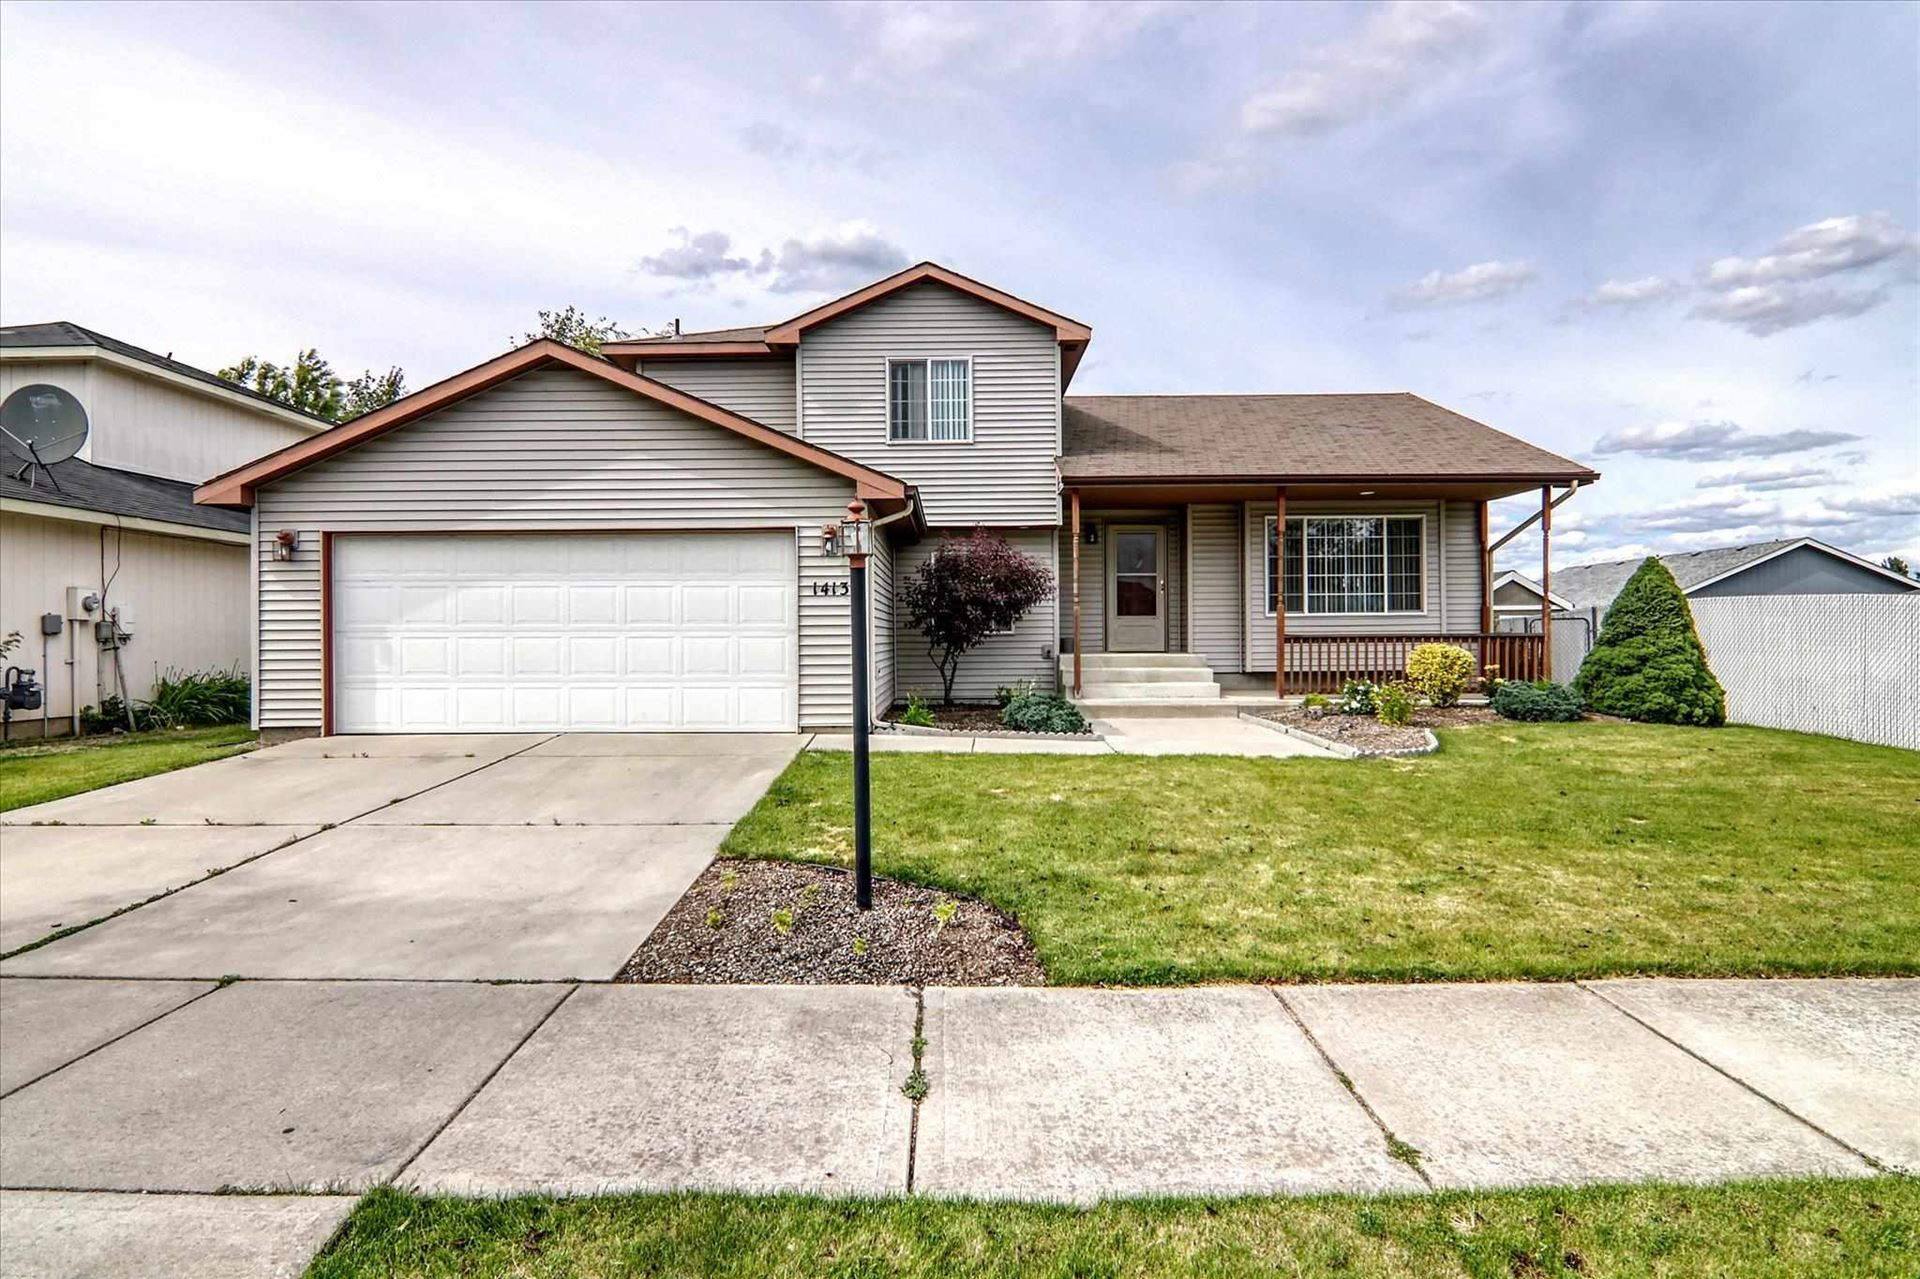 1413 E Clover St, Spokane, WA 99217 - #: 202118883